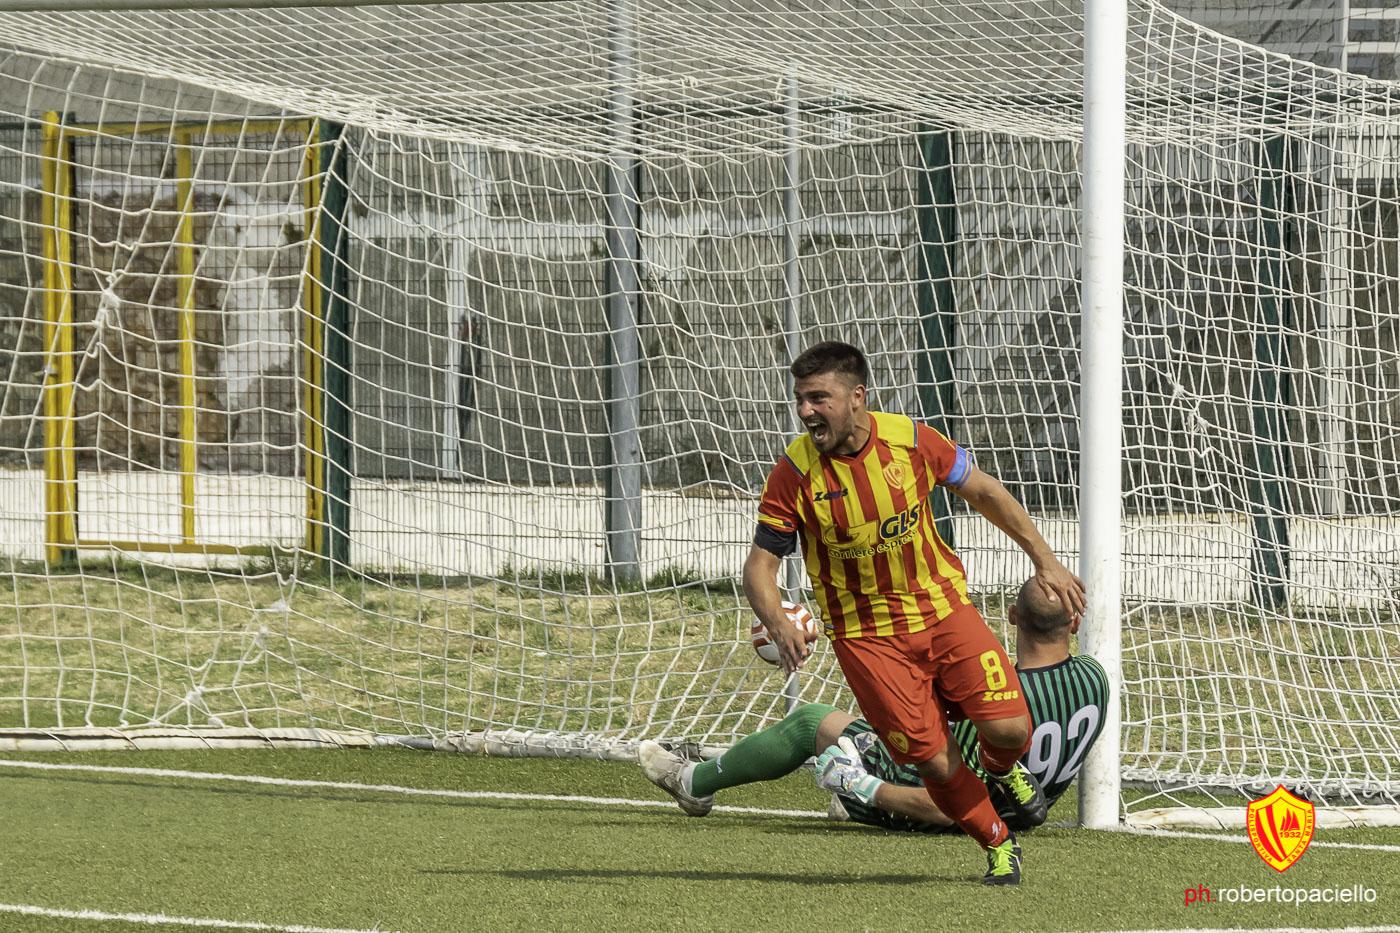 Polisportiva Santa Maria 1-0 Acireale, post-gara con Simonetti